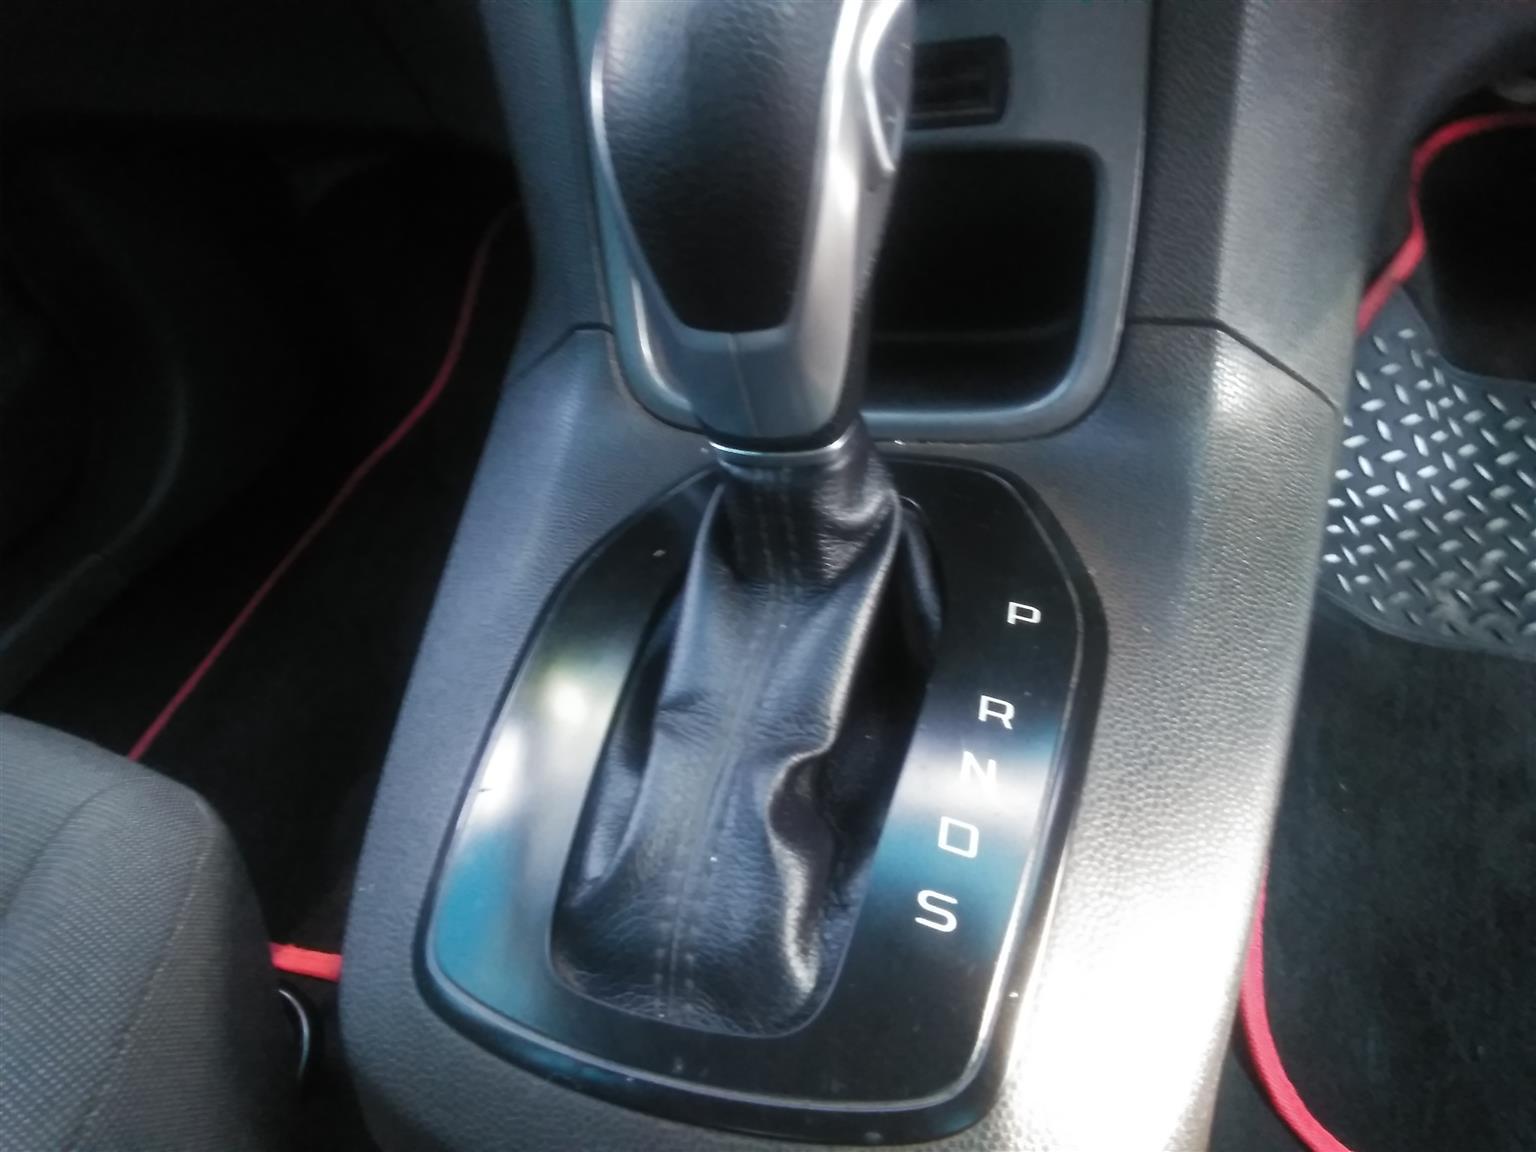 2016 Ford Fiesta hatch 5-door FIESTA 1.0 ECOBOOST TREND 5DR A/T